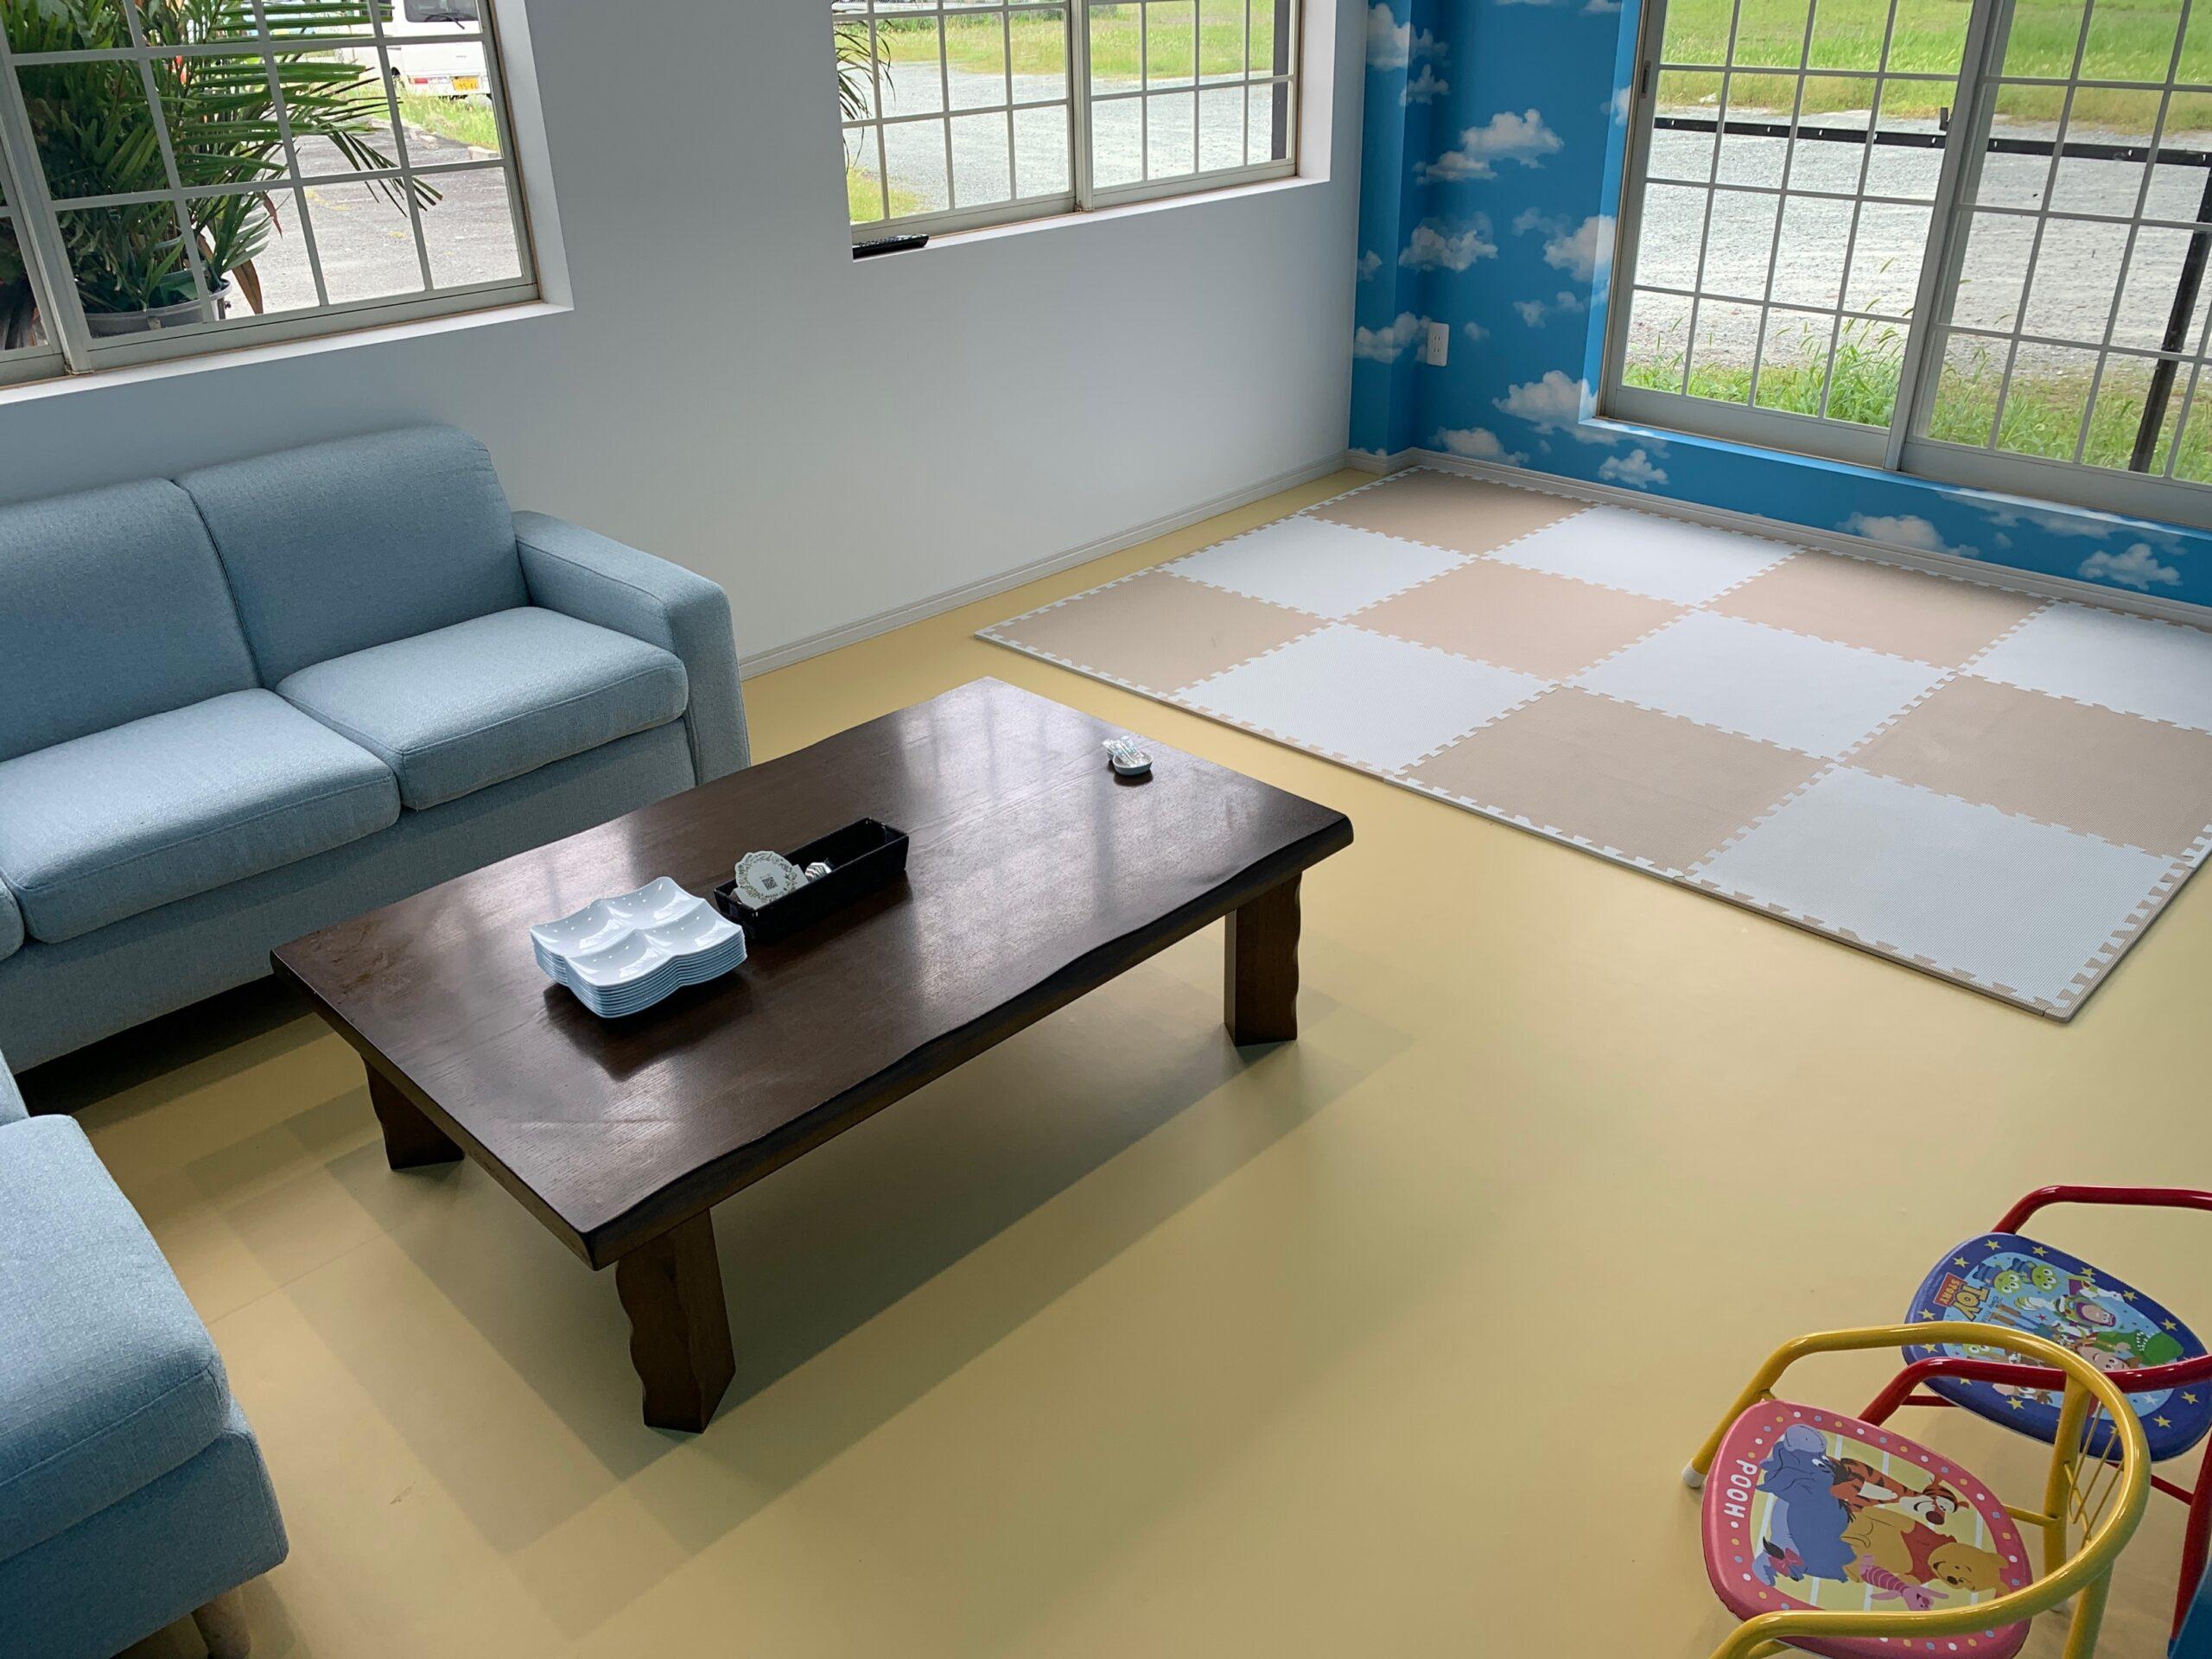 Thousand Kitchen愁月の家族用の個室